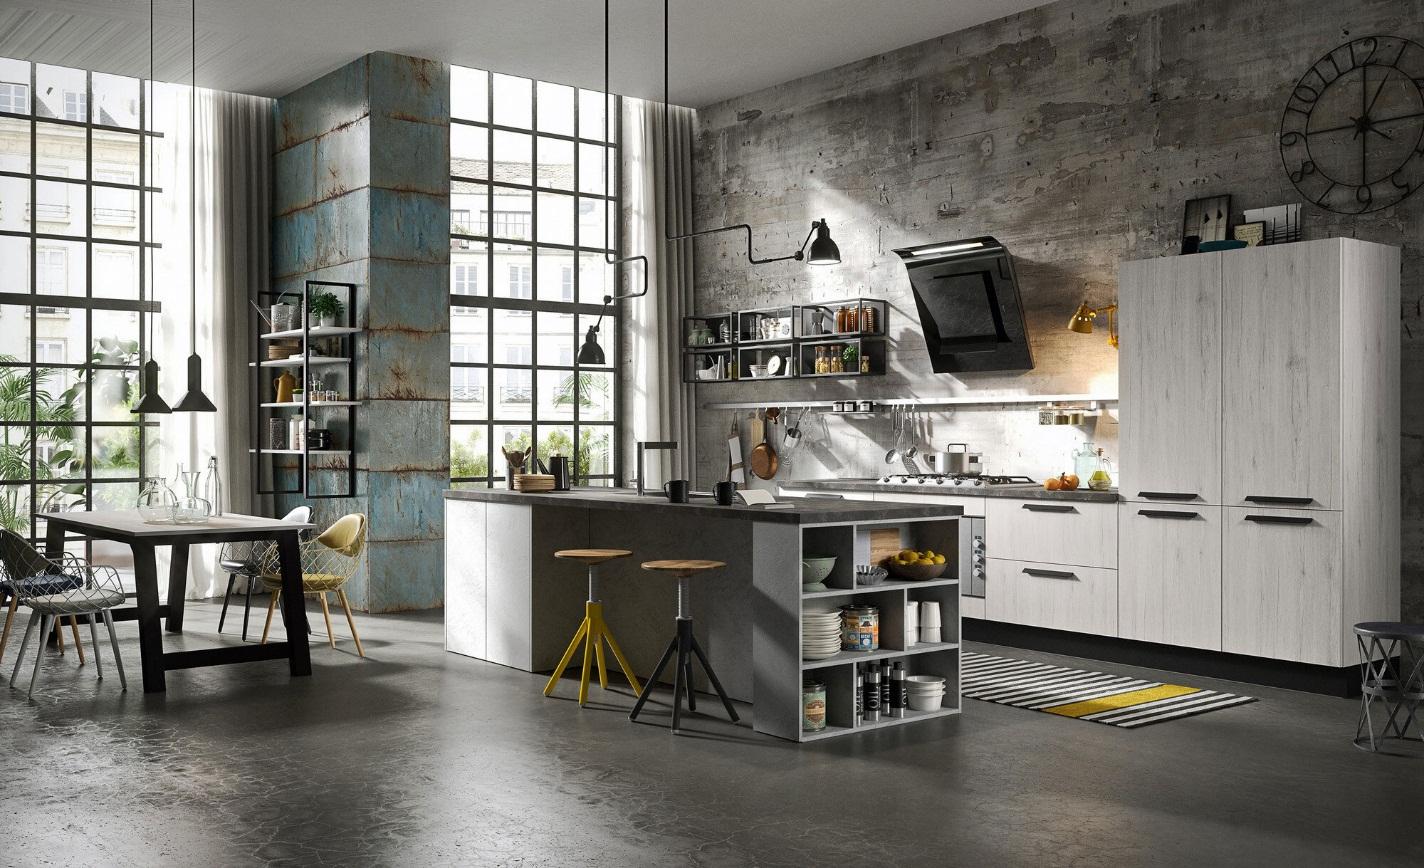 طراحی آشپزخانه مدرن 20